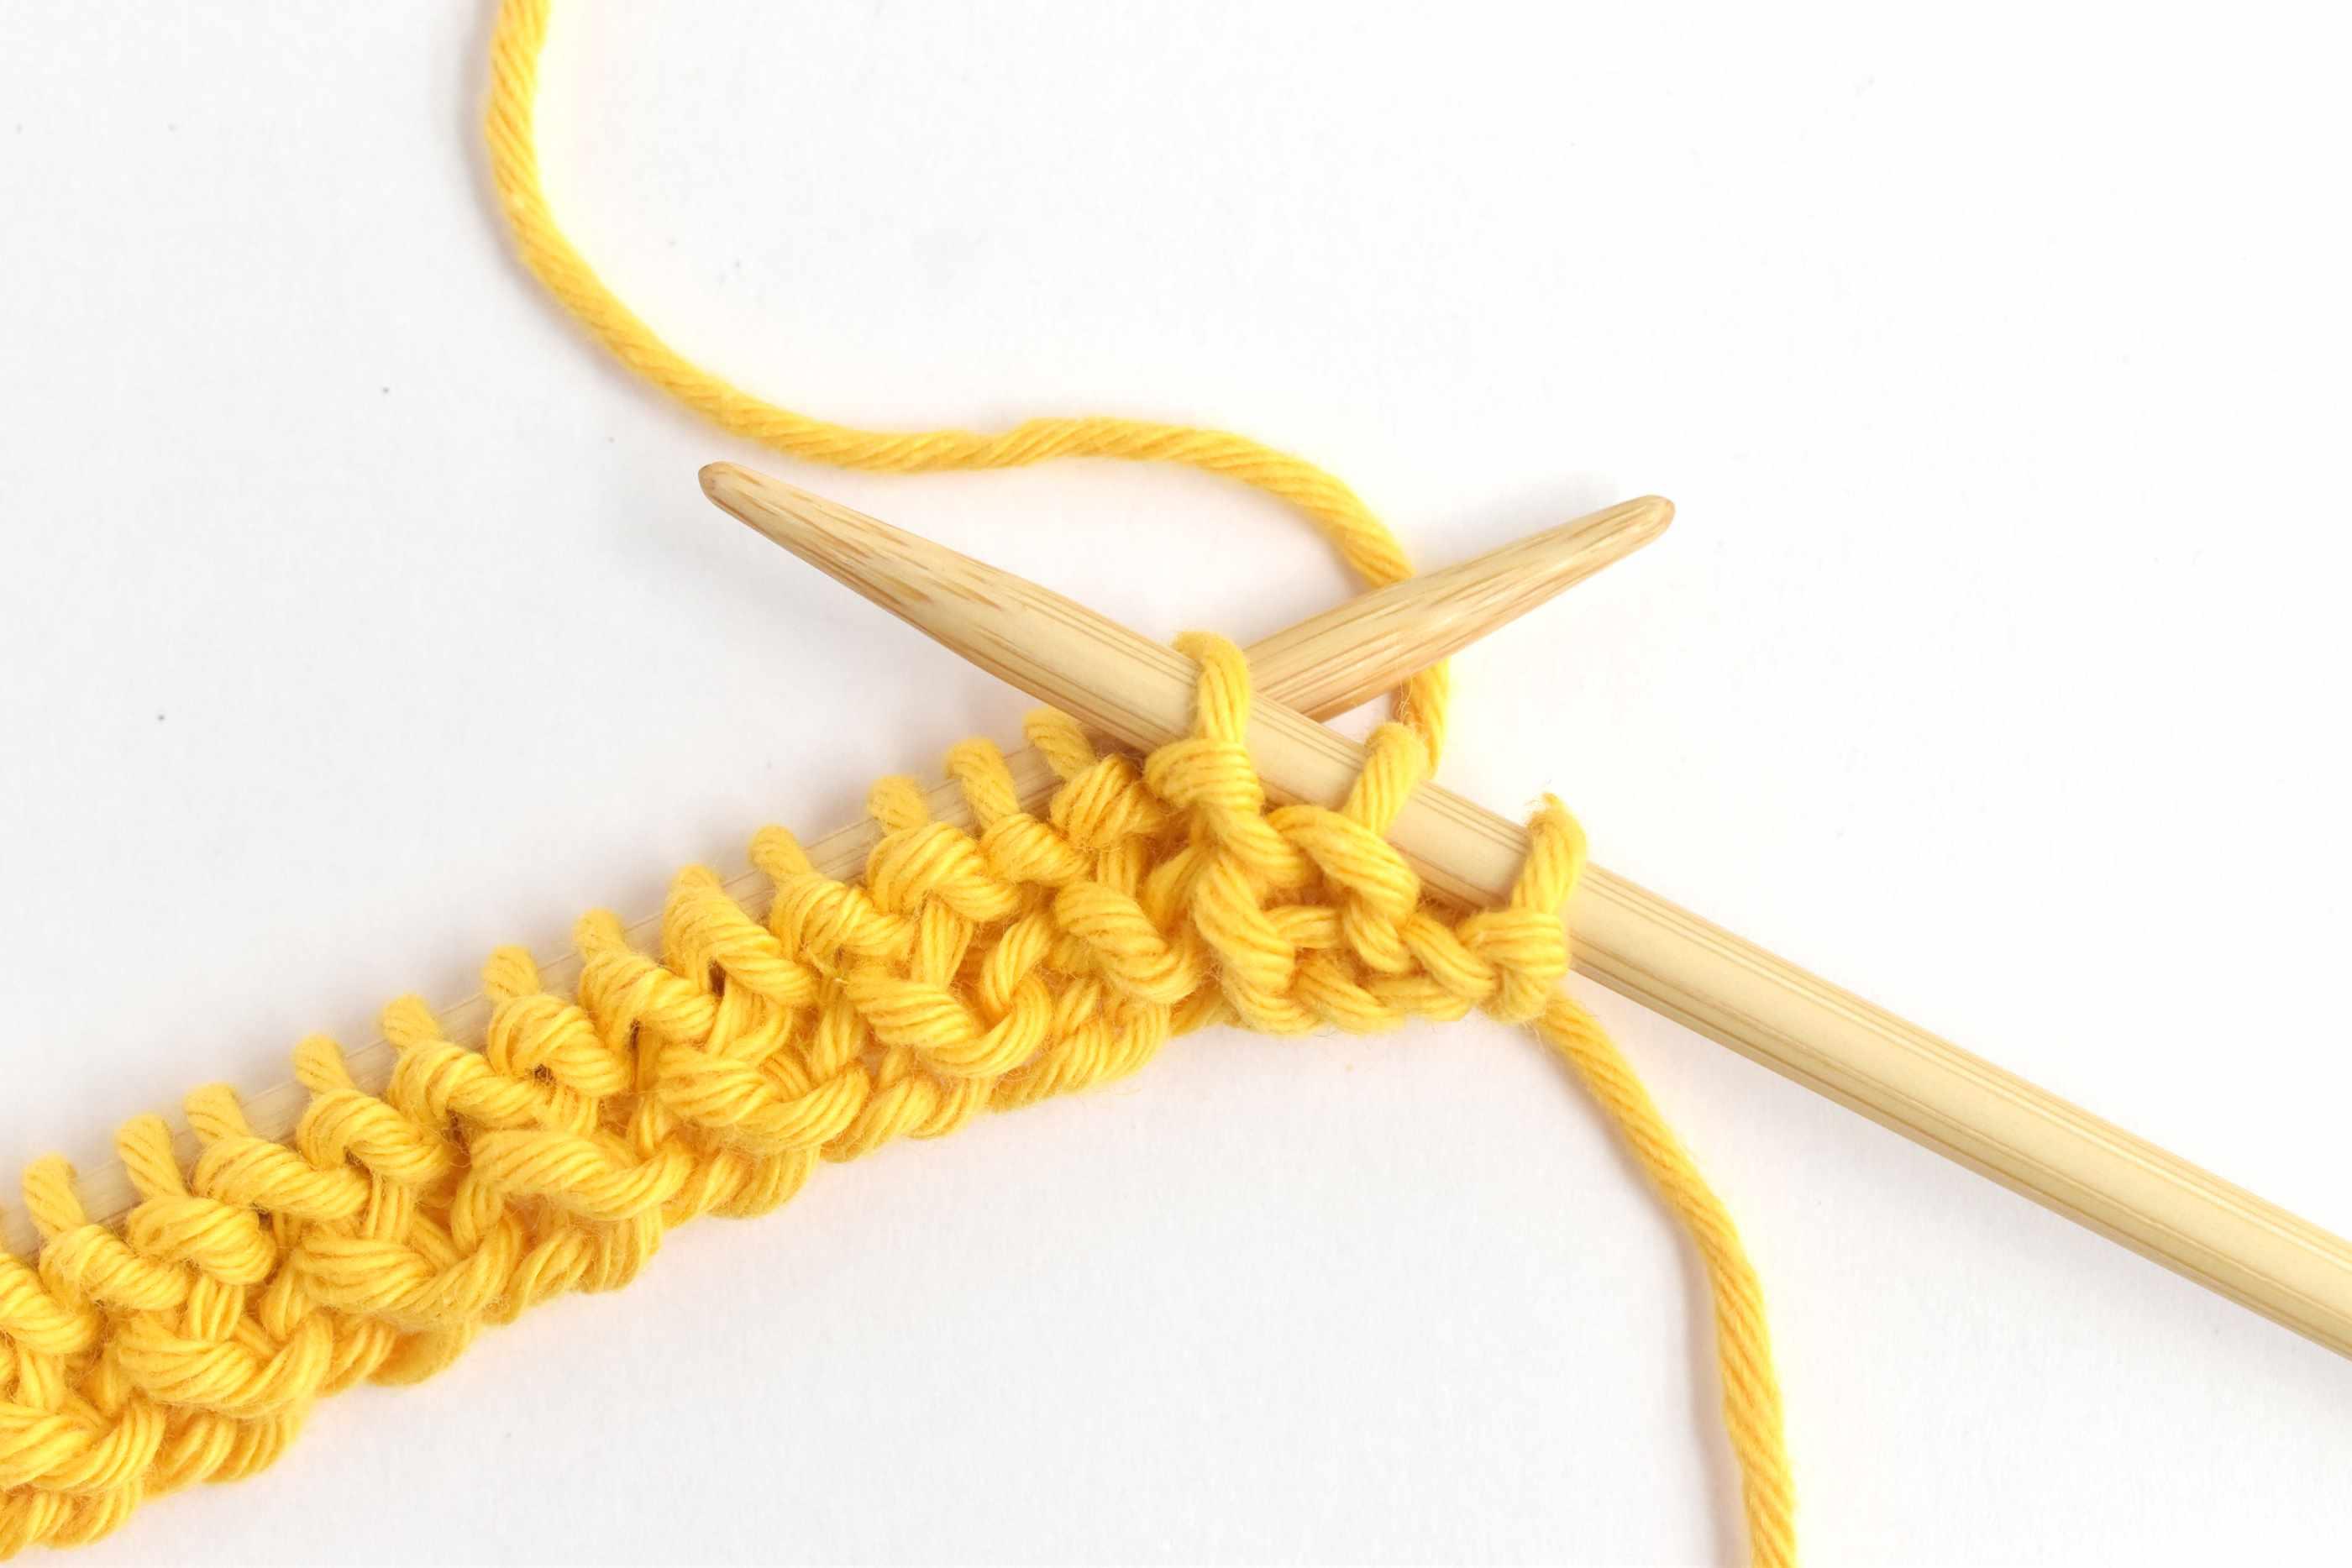 Honeycomb Stitch Row Four: Slipping the Third Stitch